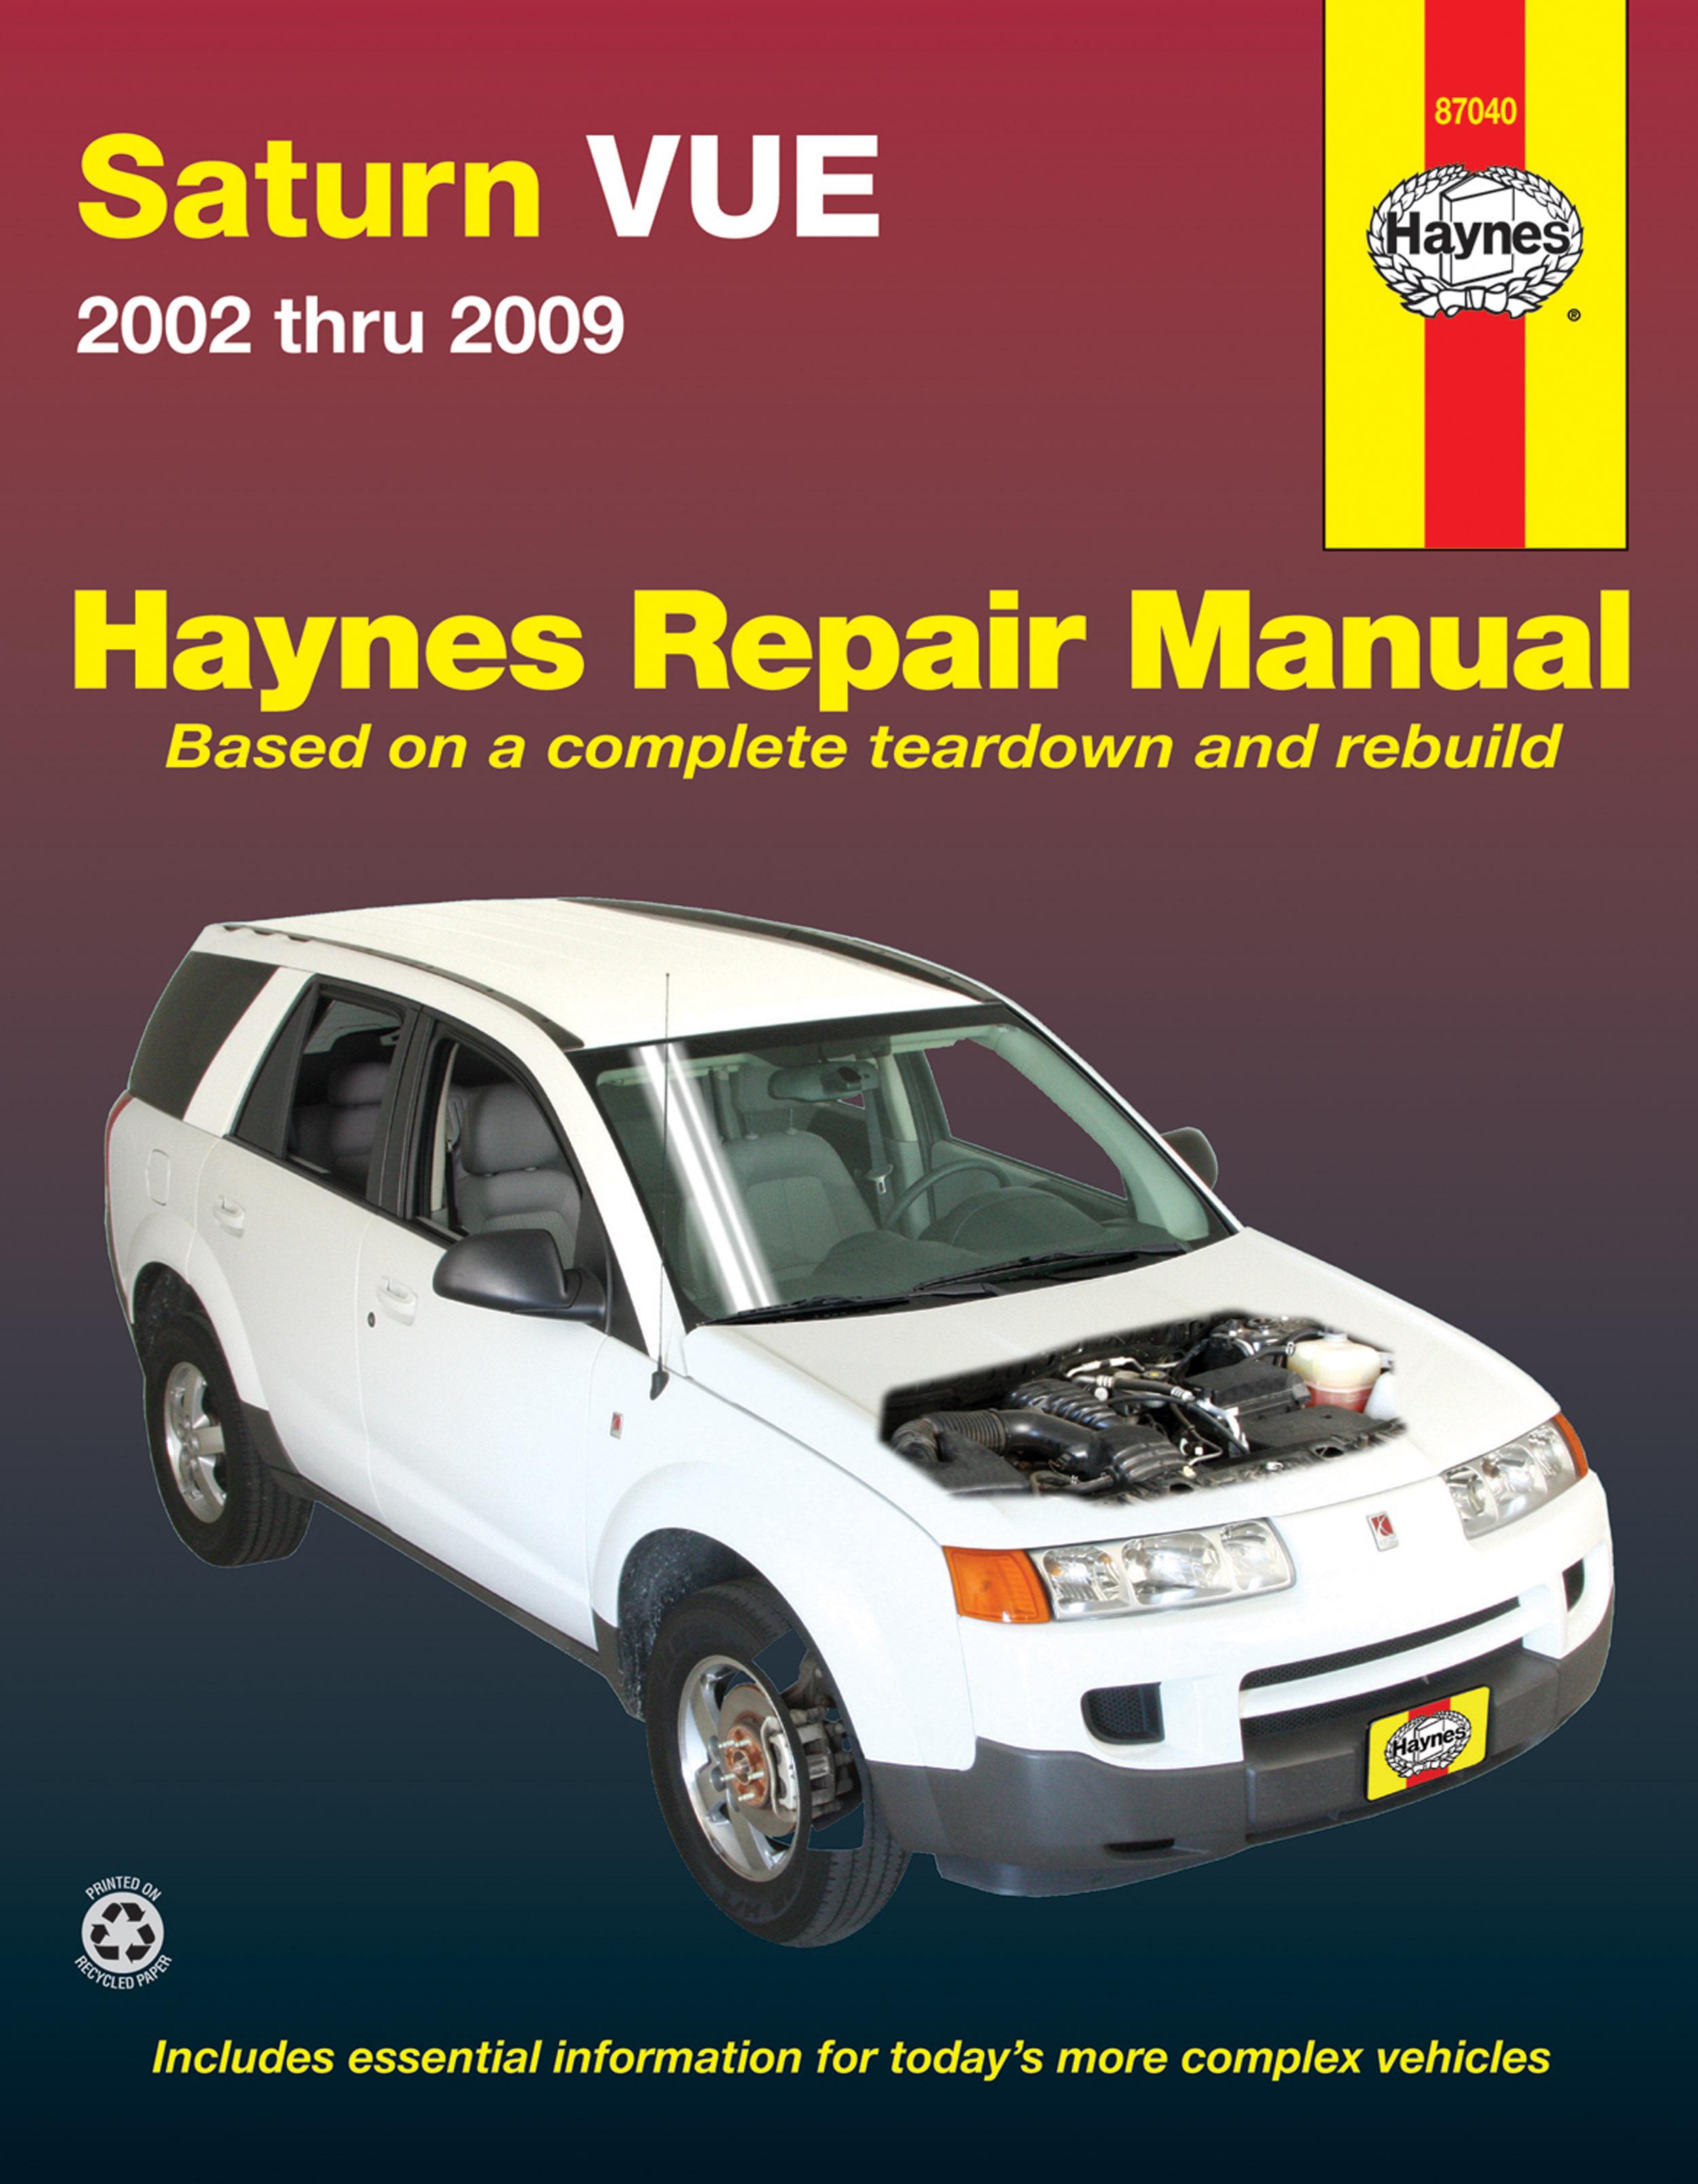 Enlarge Saturn VUE (02-09) Haynes Repair Manual